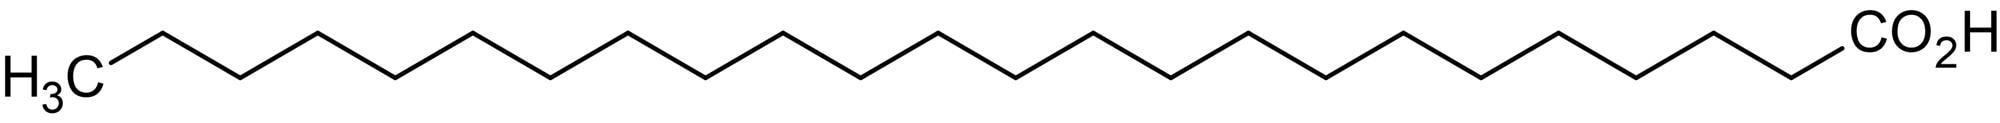 Chemical Structure - Tetracosanoic acid (Lignoceric acid), Long chain saturated fatty acid (ab143875)